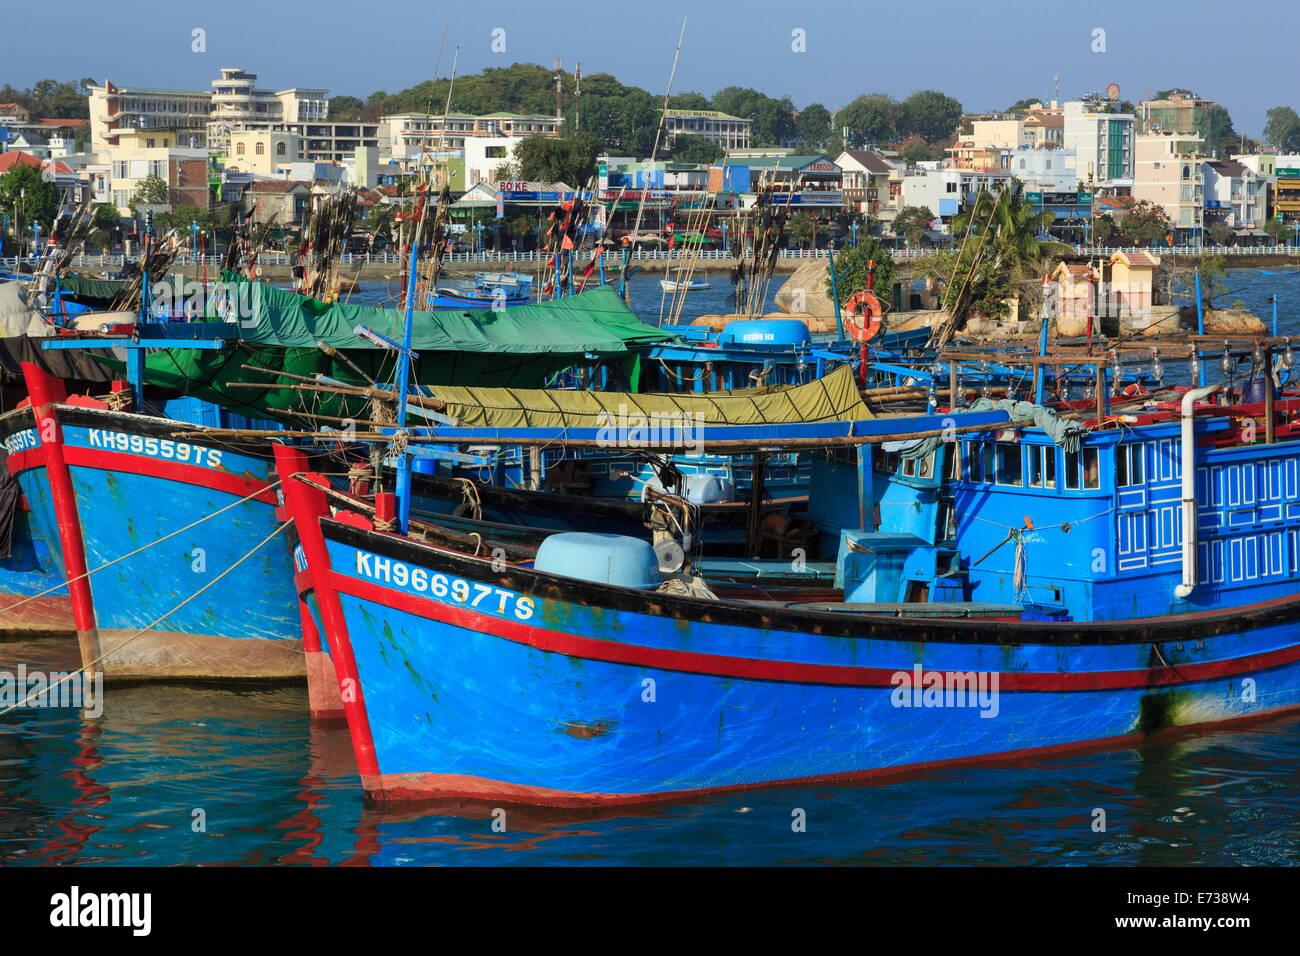 Fishing boats on Cai River, Nha Trang City, Vietnam, Indochina, Southeast Asia, Asia - Stock Image